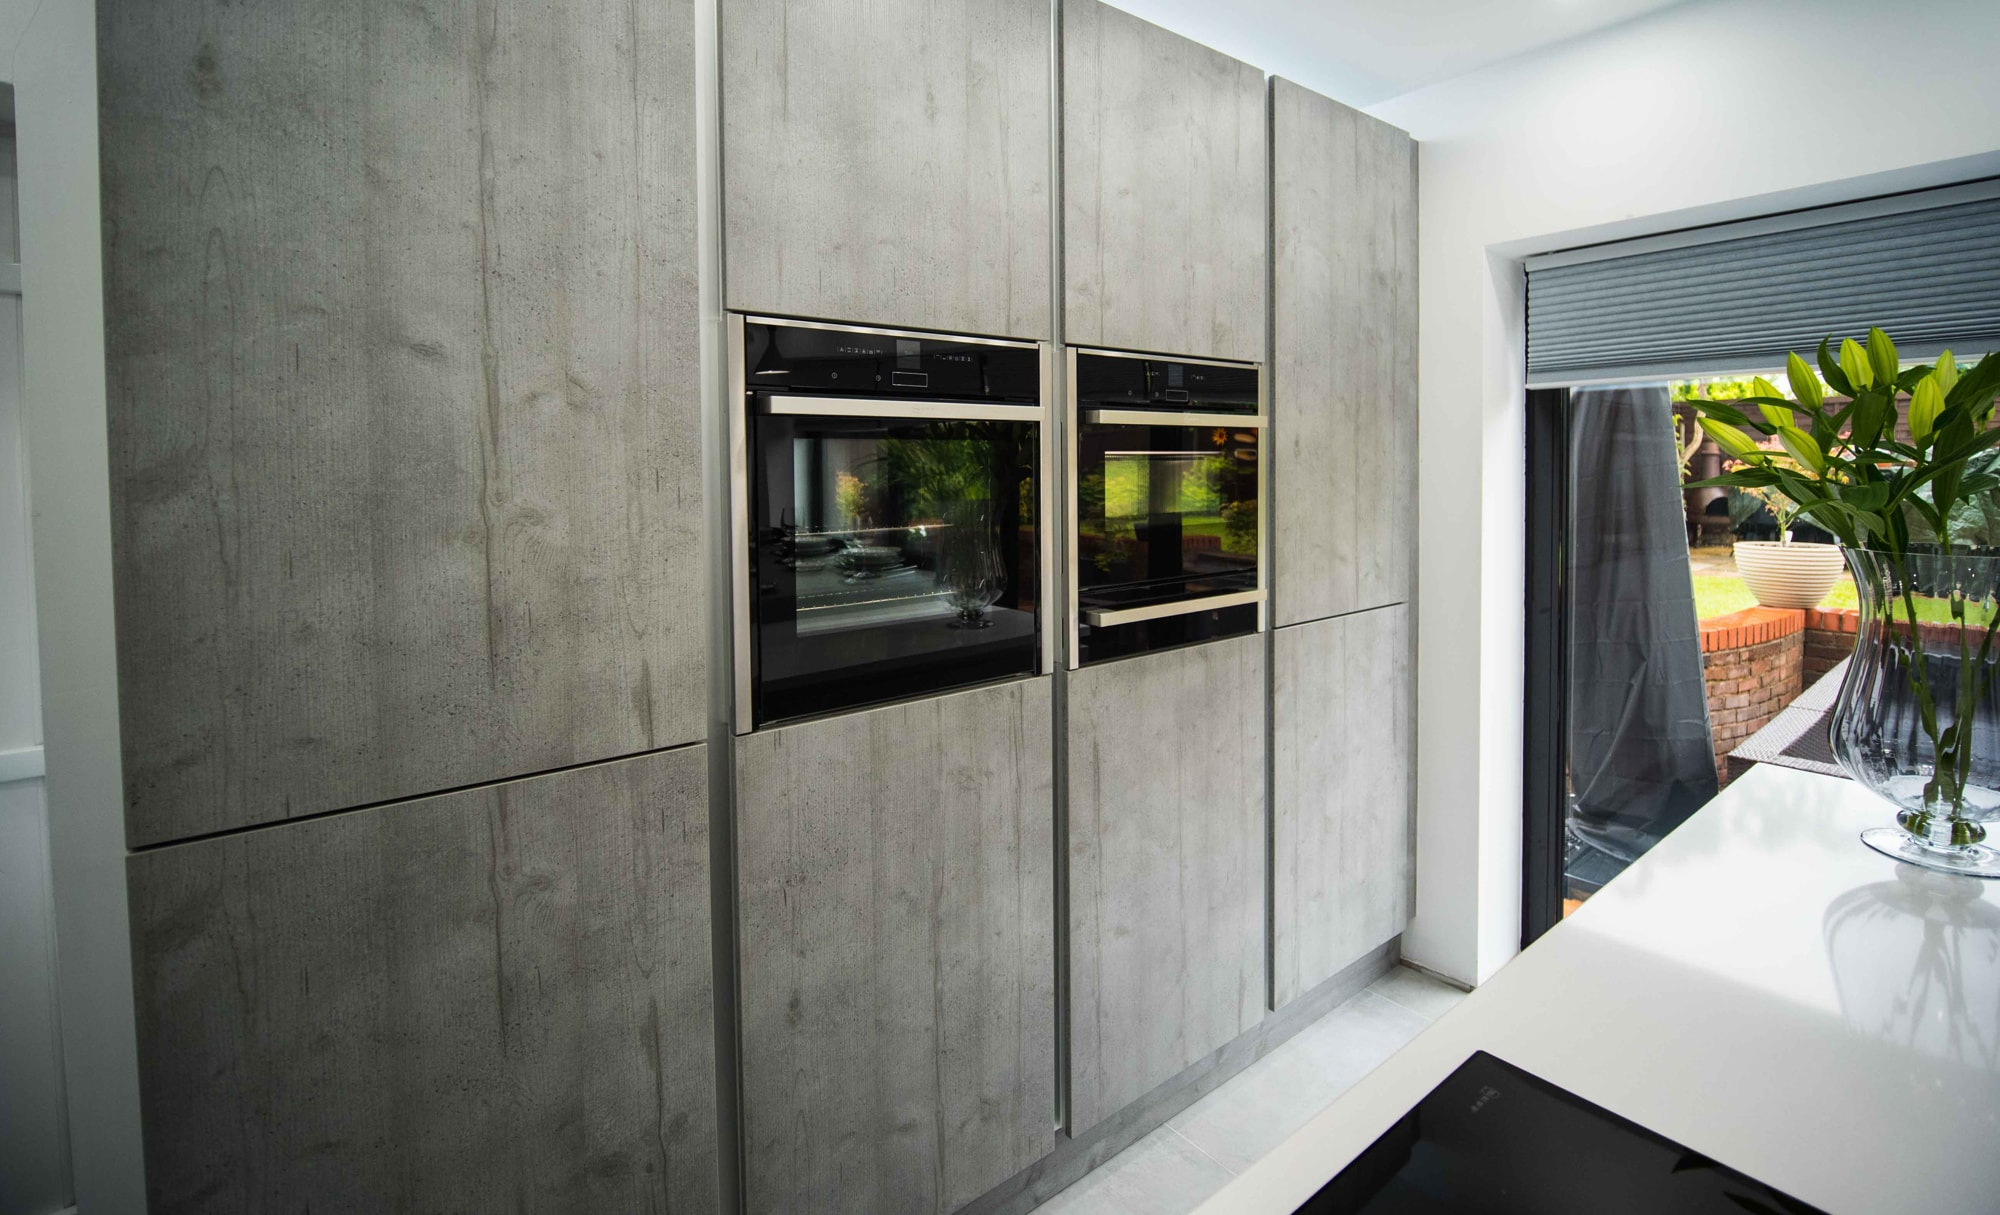 The Gallery Zola Gloss Dust Grey Kitchen Storage